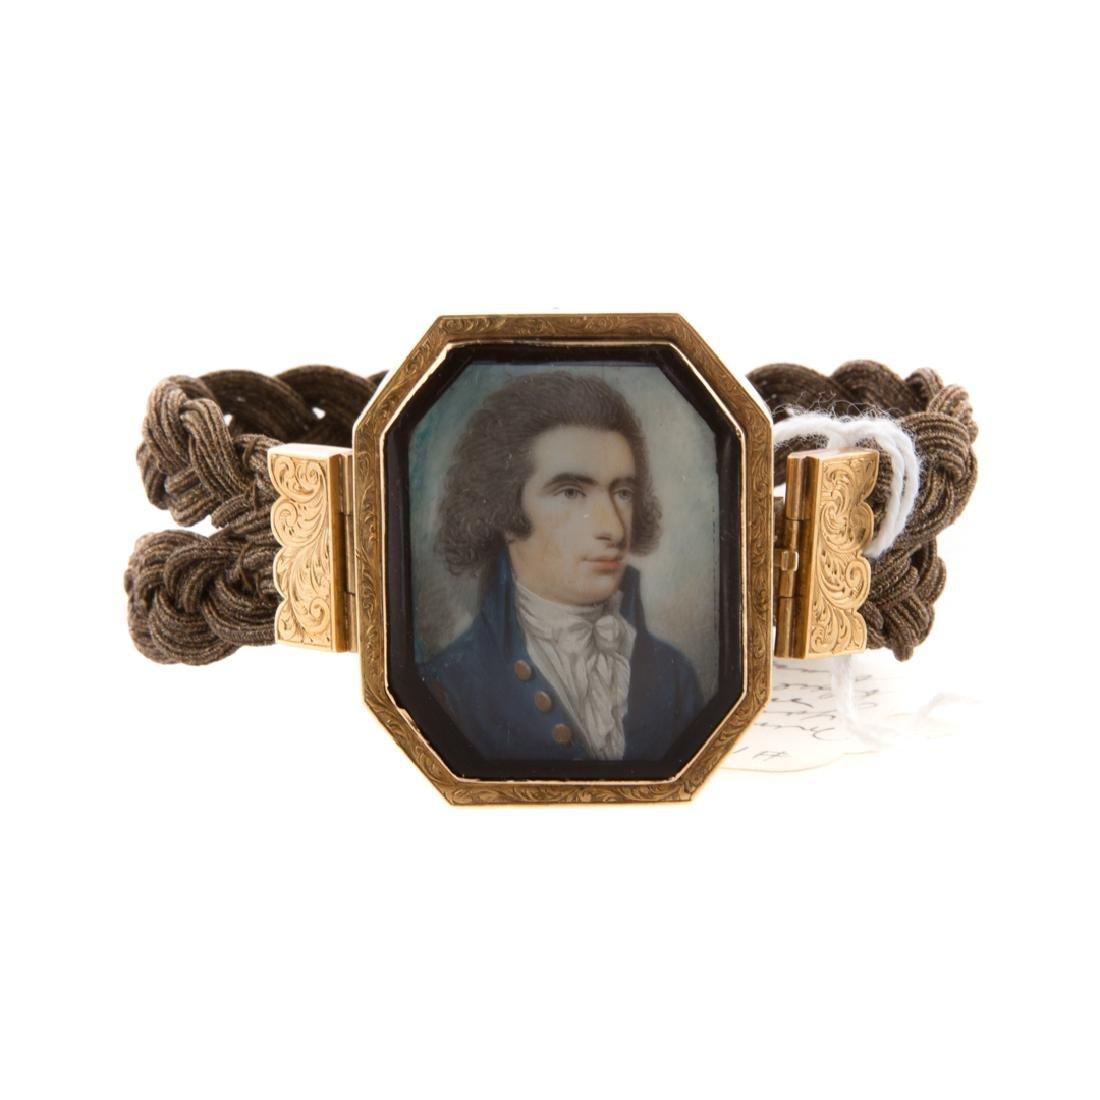 American School 18th century. Miniature portrait